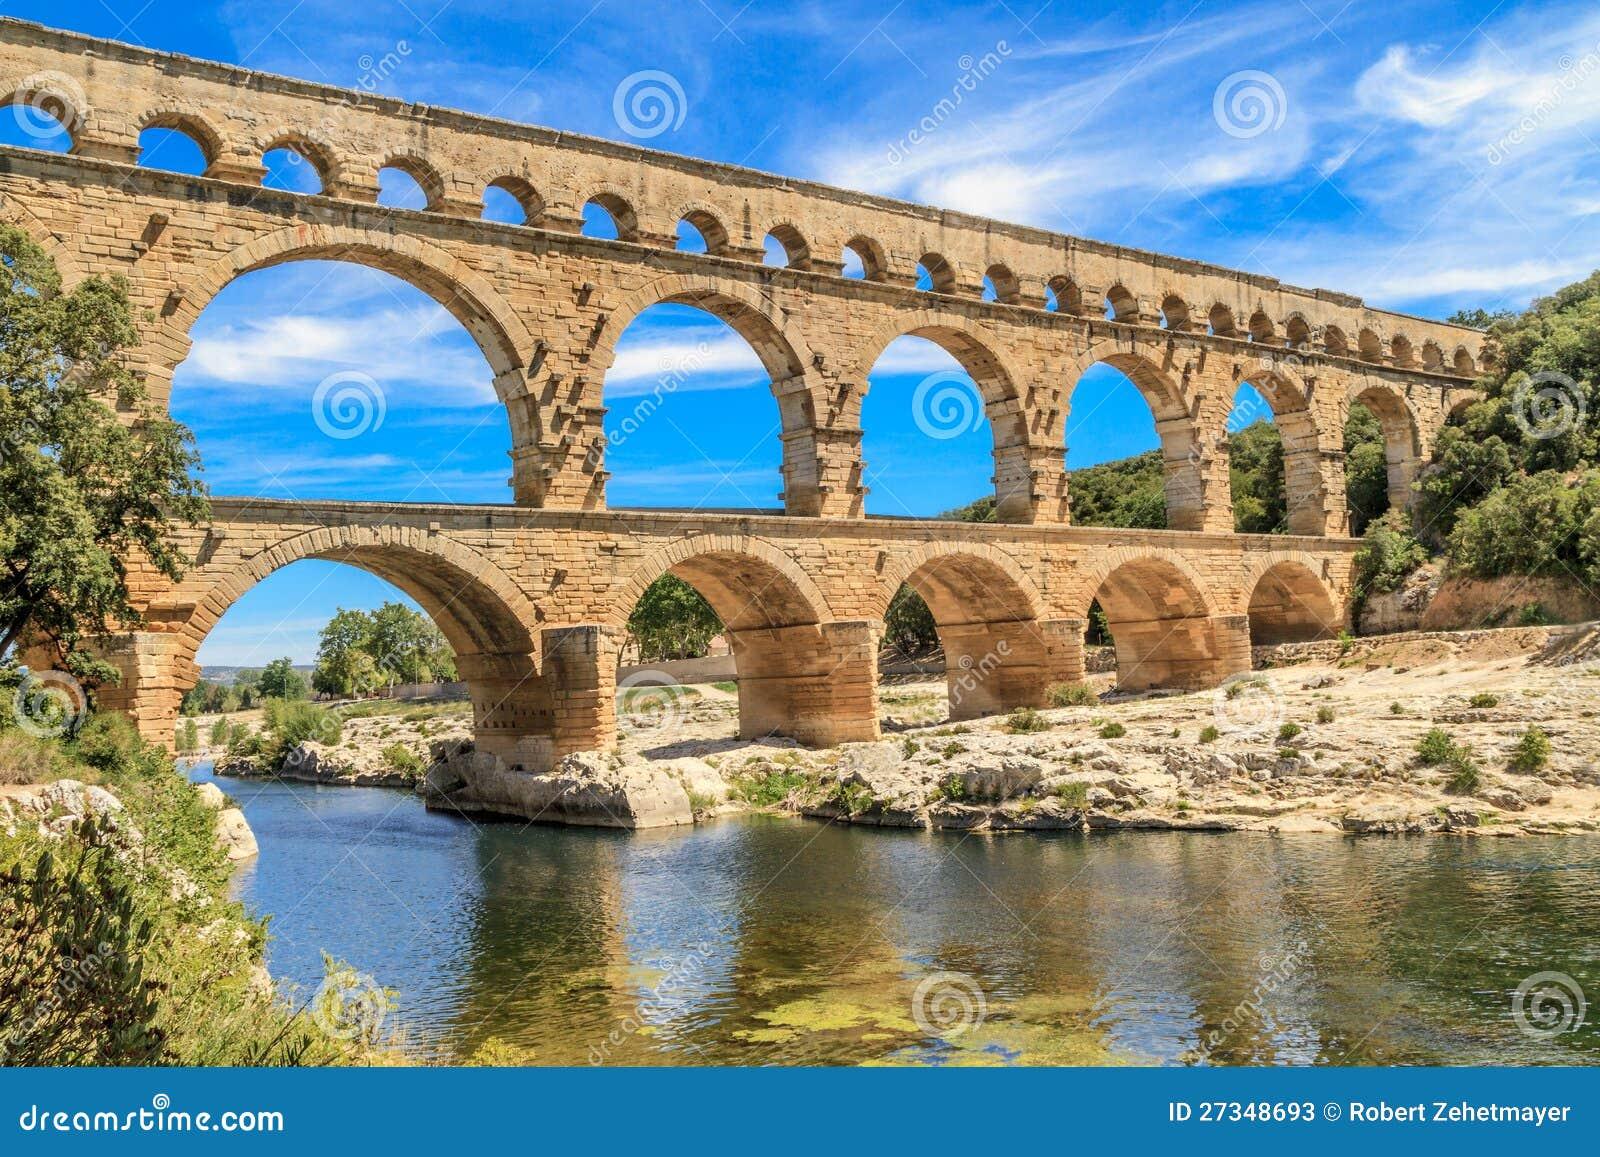 Pont DU Gard, Nimes, Provence, Frankreich